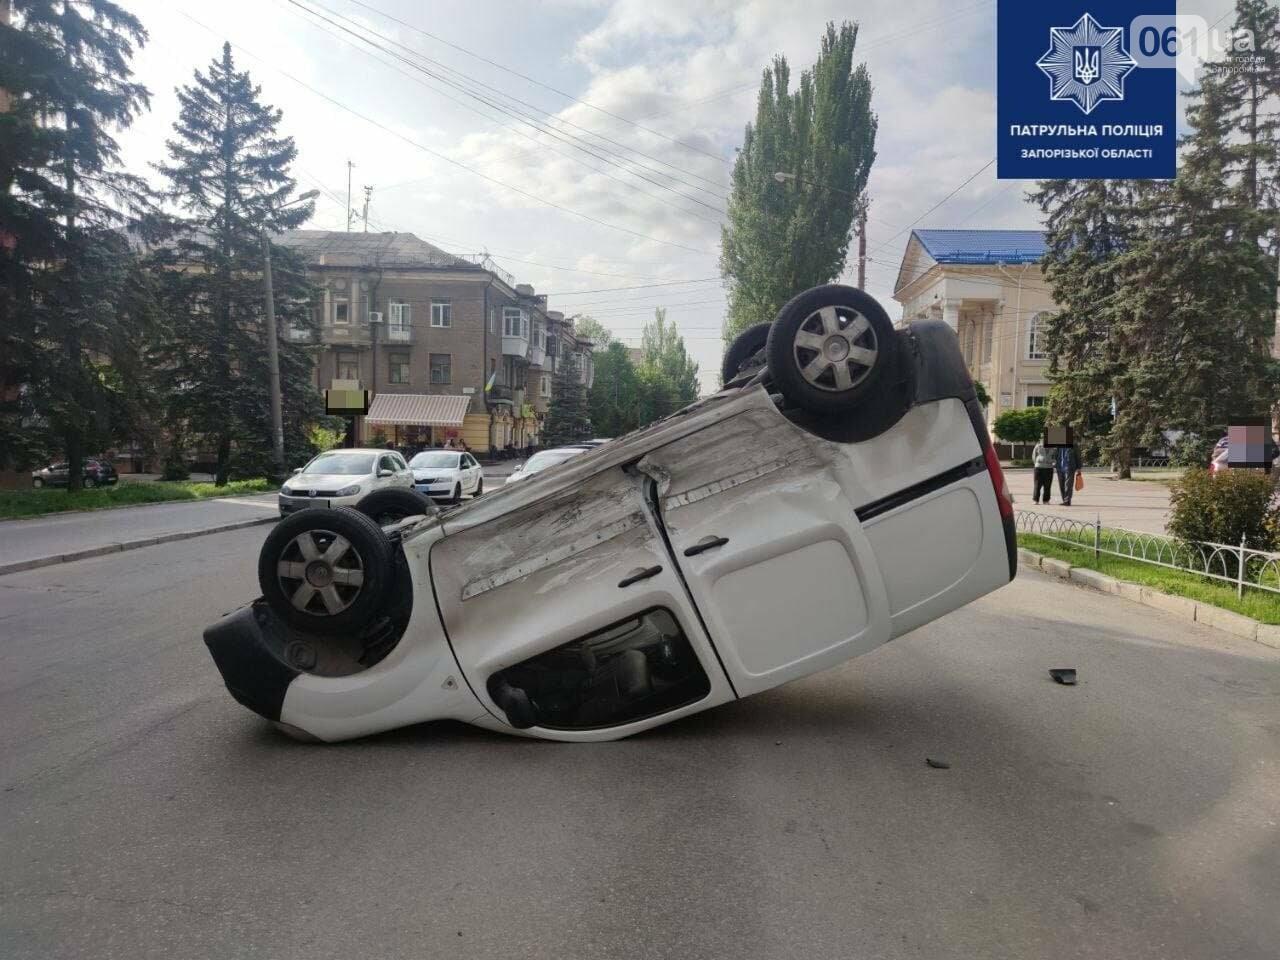 photo2021 05 2123 48 12 60a8f0b6269aa - В центре Запорожья в результате ДТП перевернулся легковой автомобиль, - ФОТО